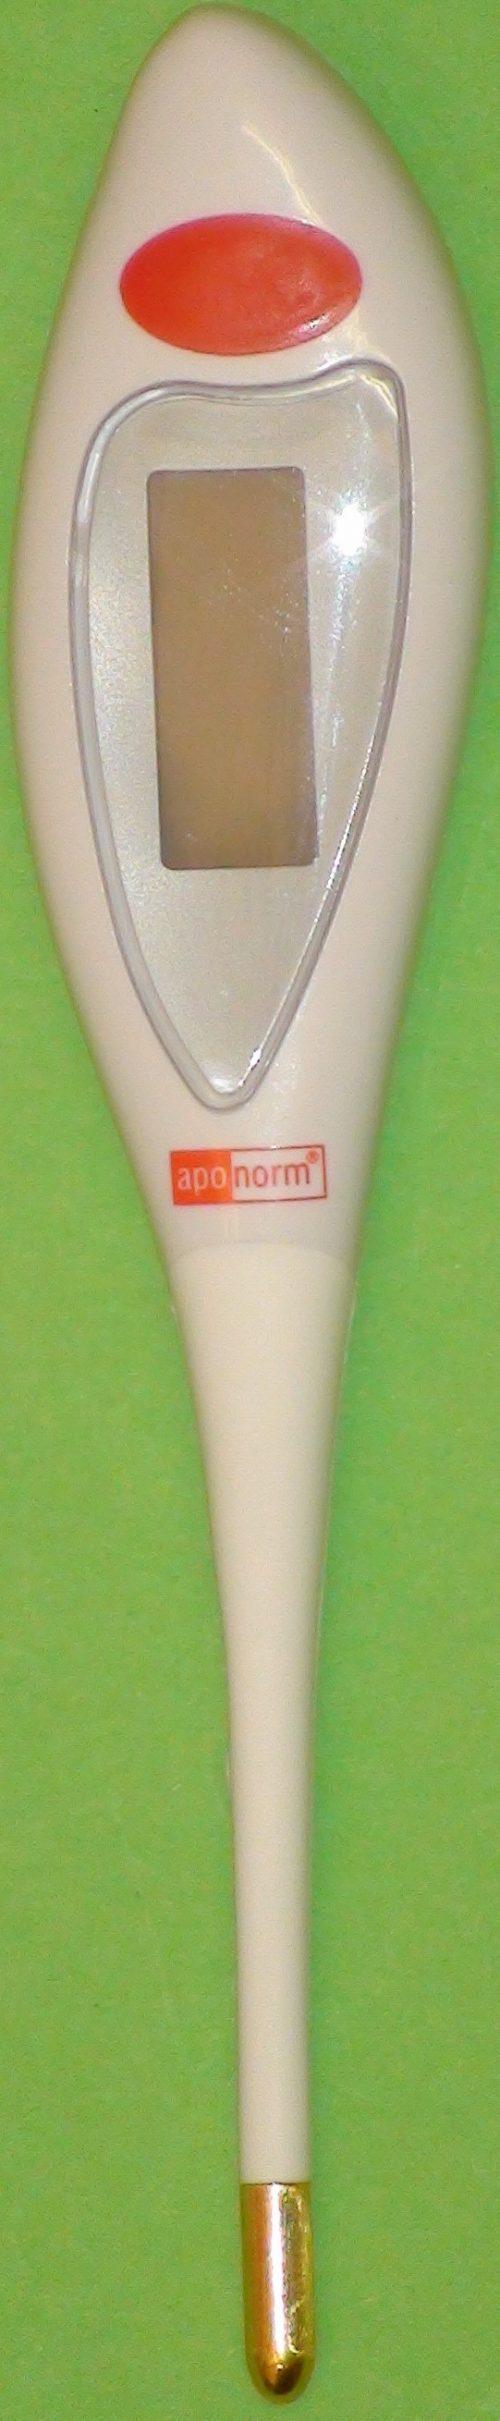 Aponorm® Sensitive Fieberthermometer